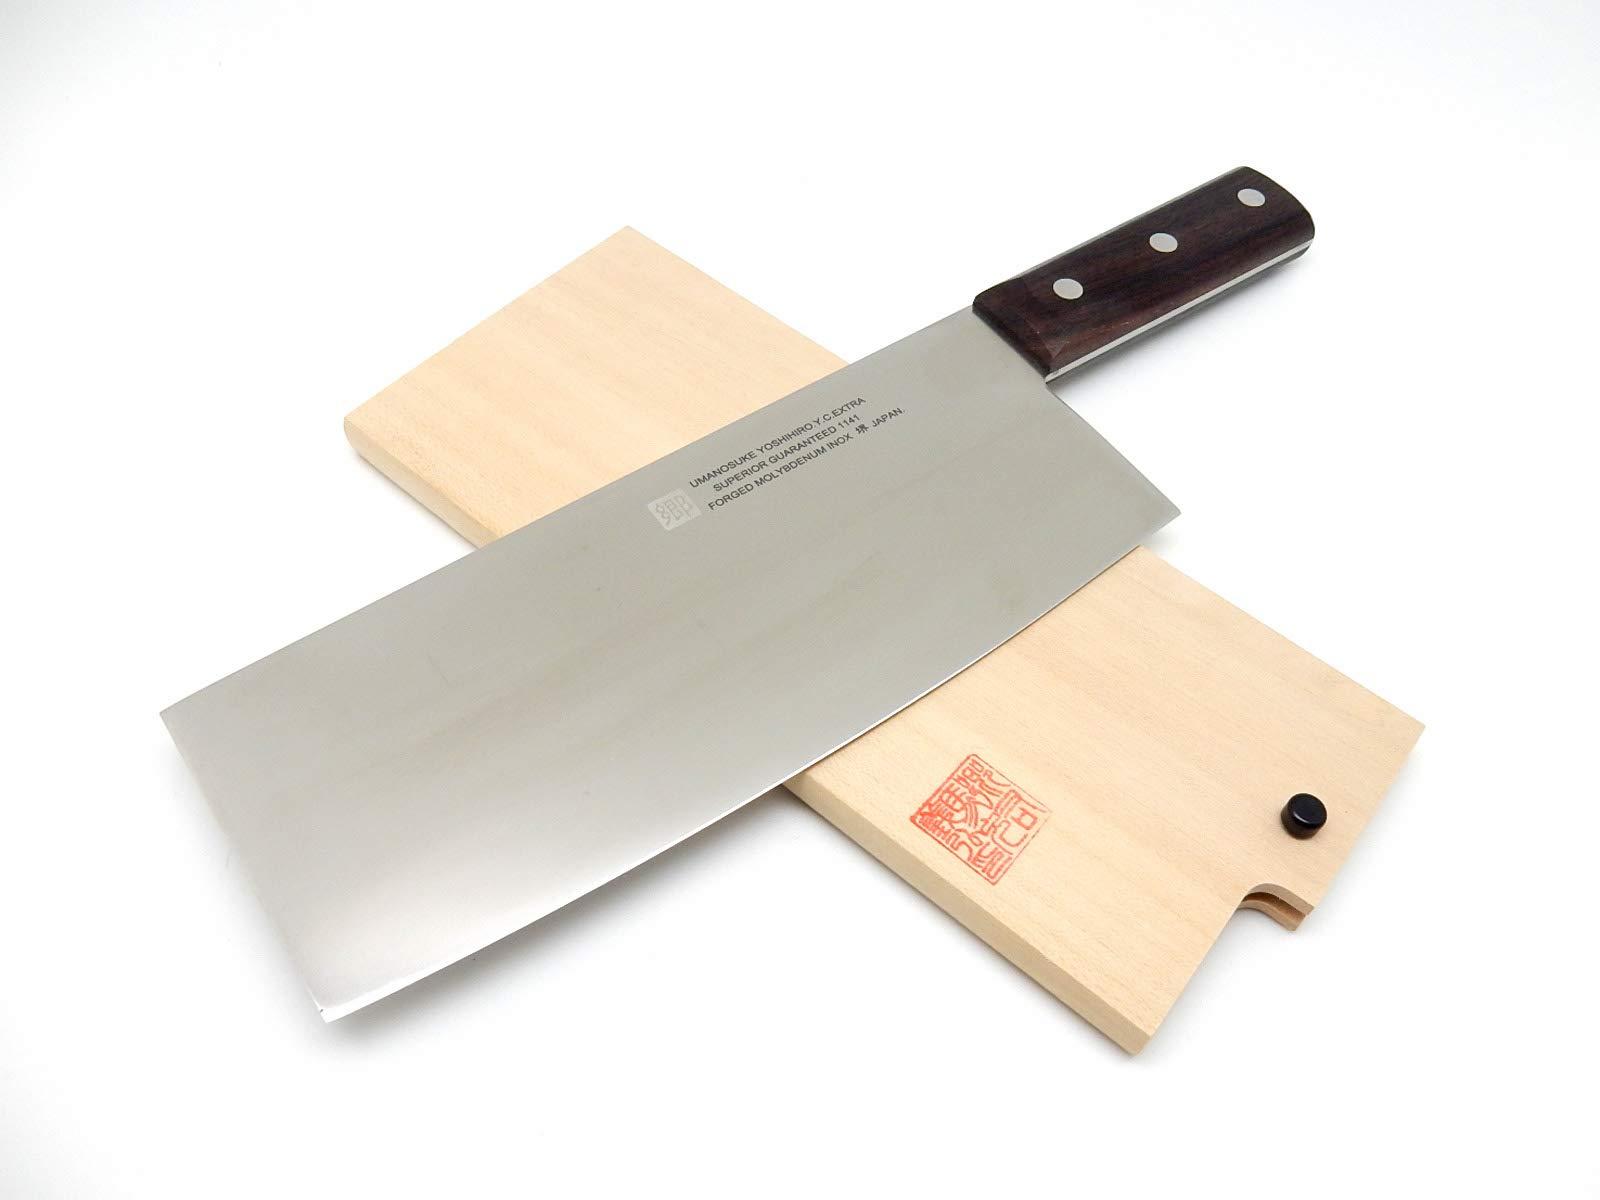 Yoshihiro 8A Mo.V Steel, INOX 1141 Guranteed Chinese Cleaver Knife 220mm/8.7'', with Wooden Saya Cover by Yoshihiro